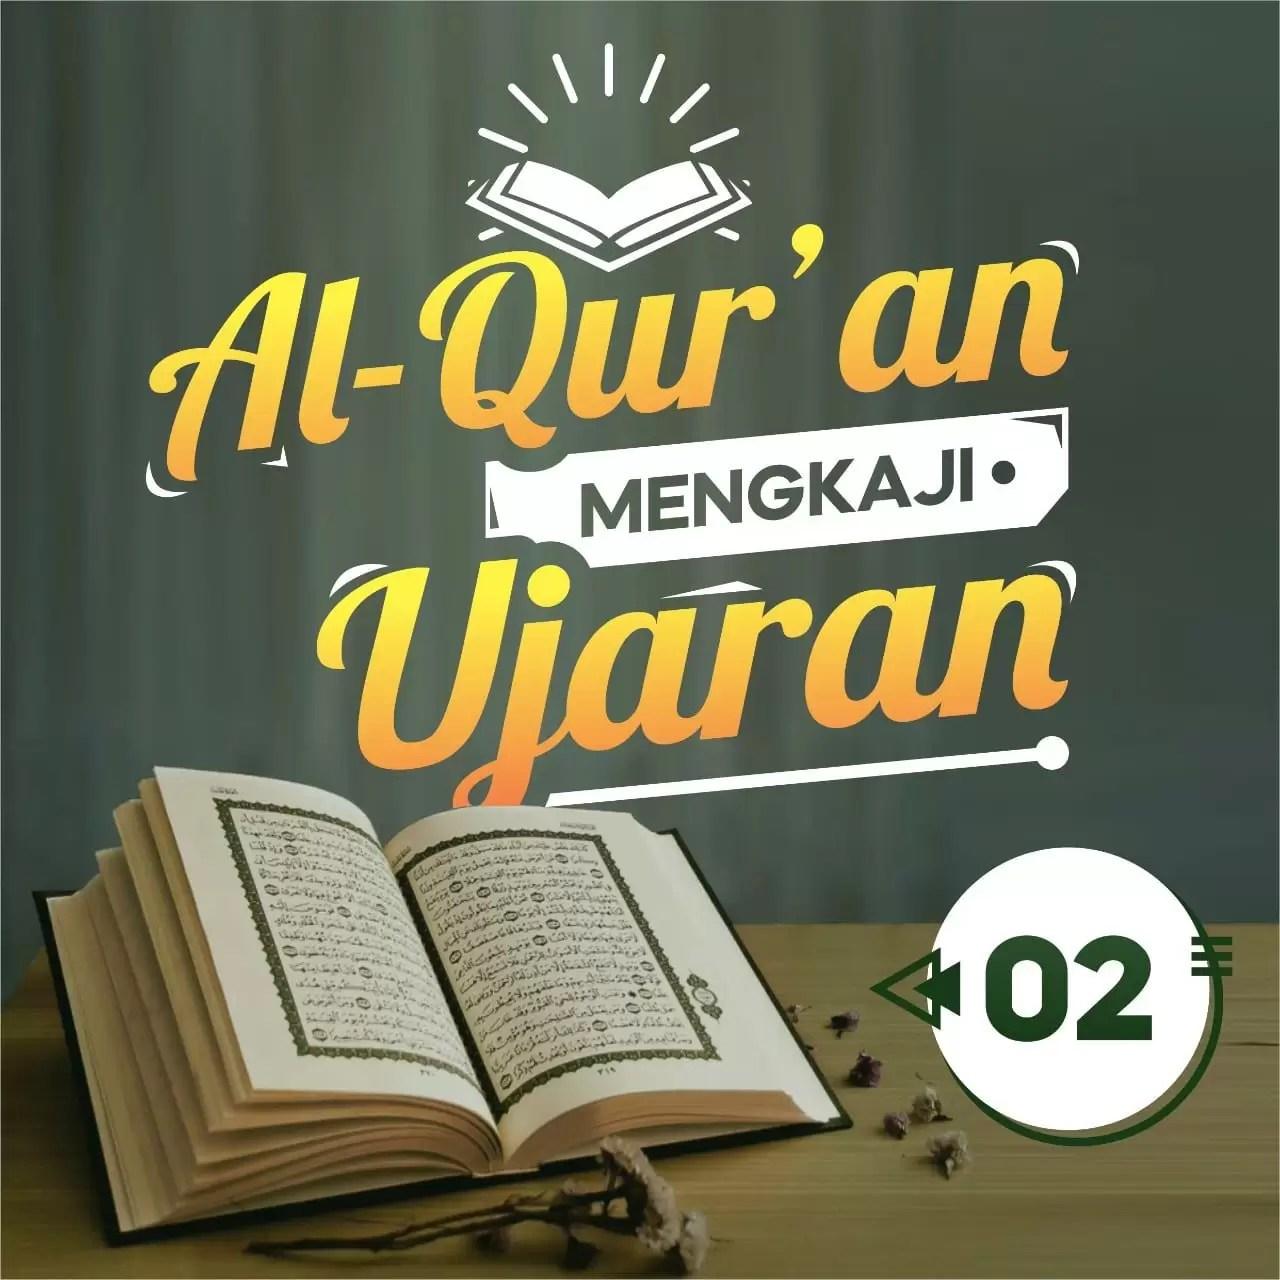 Al-Qur'an Mengkaji Ujaran (II)